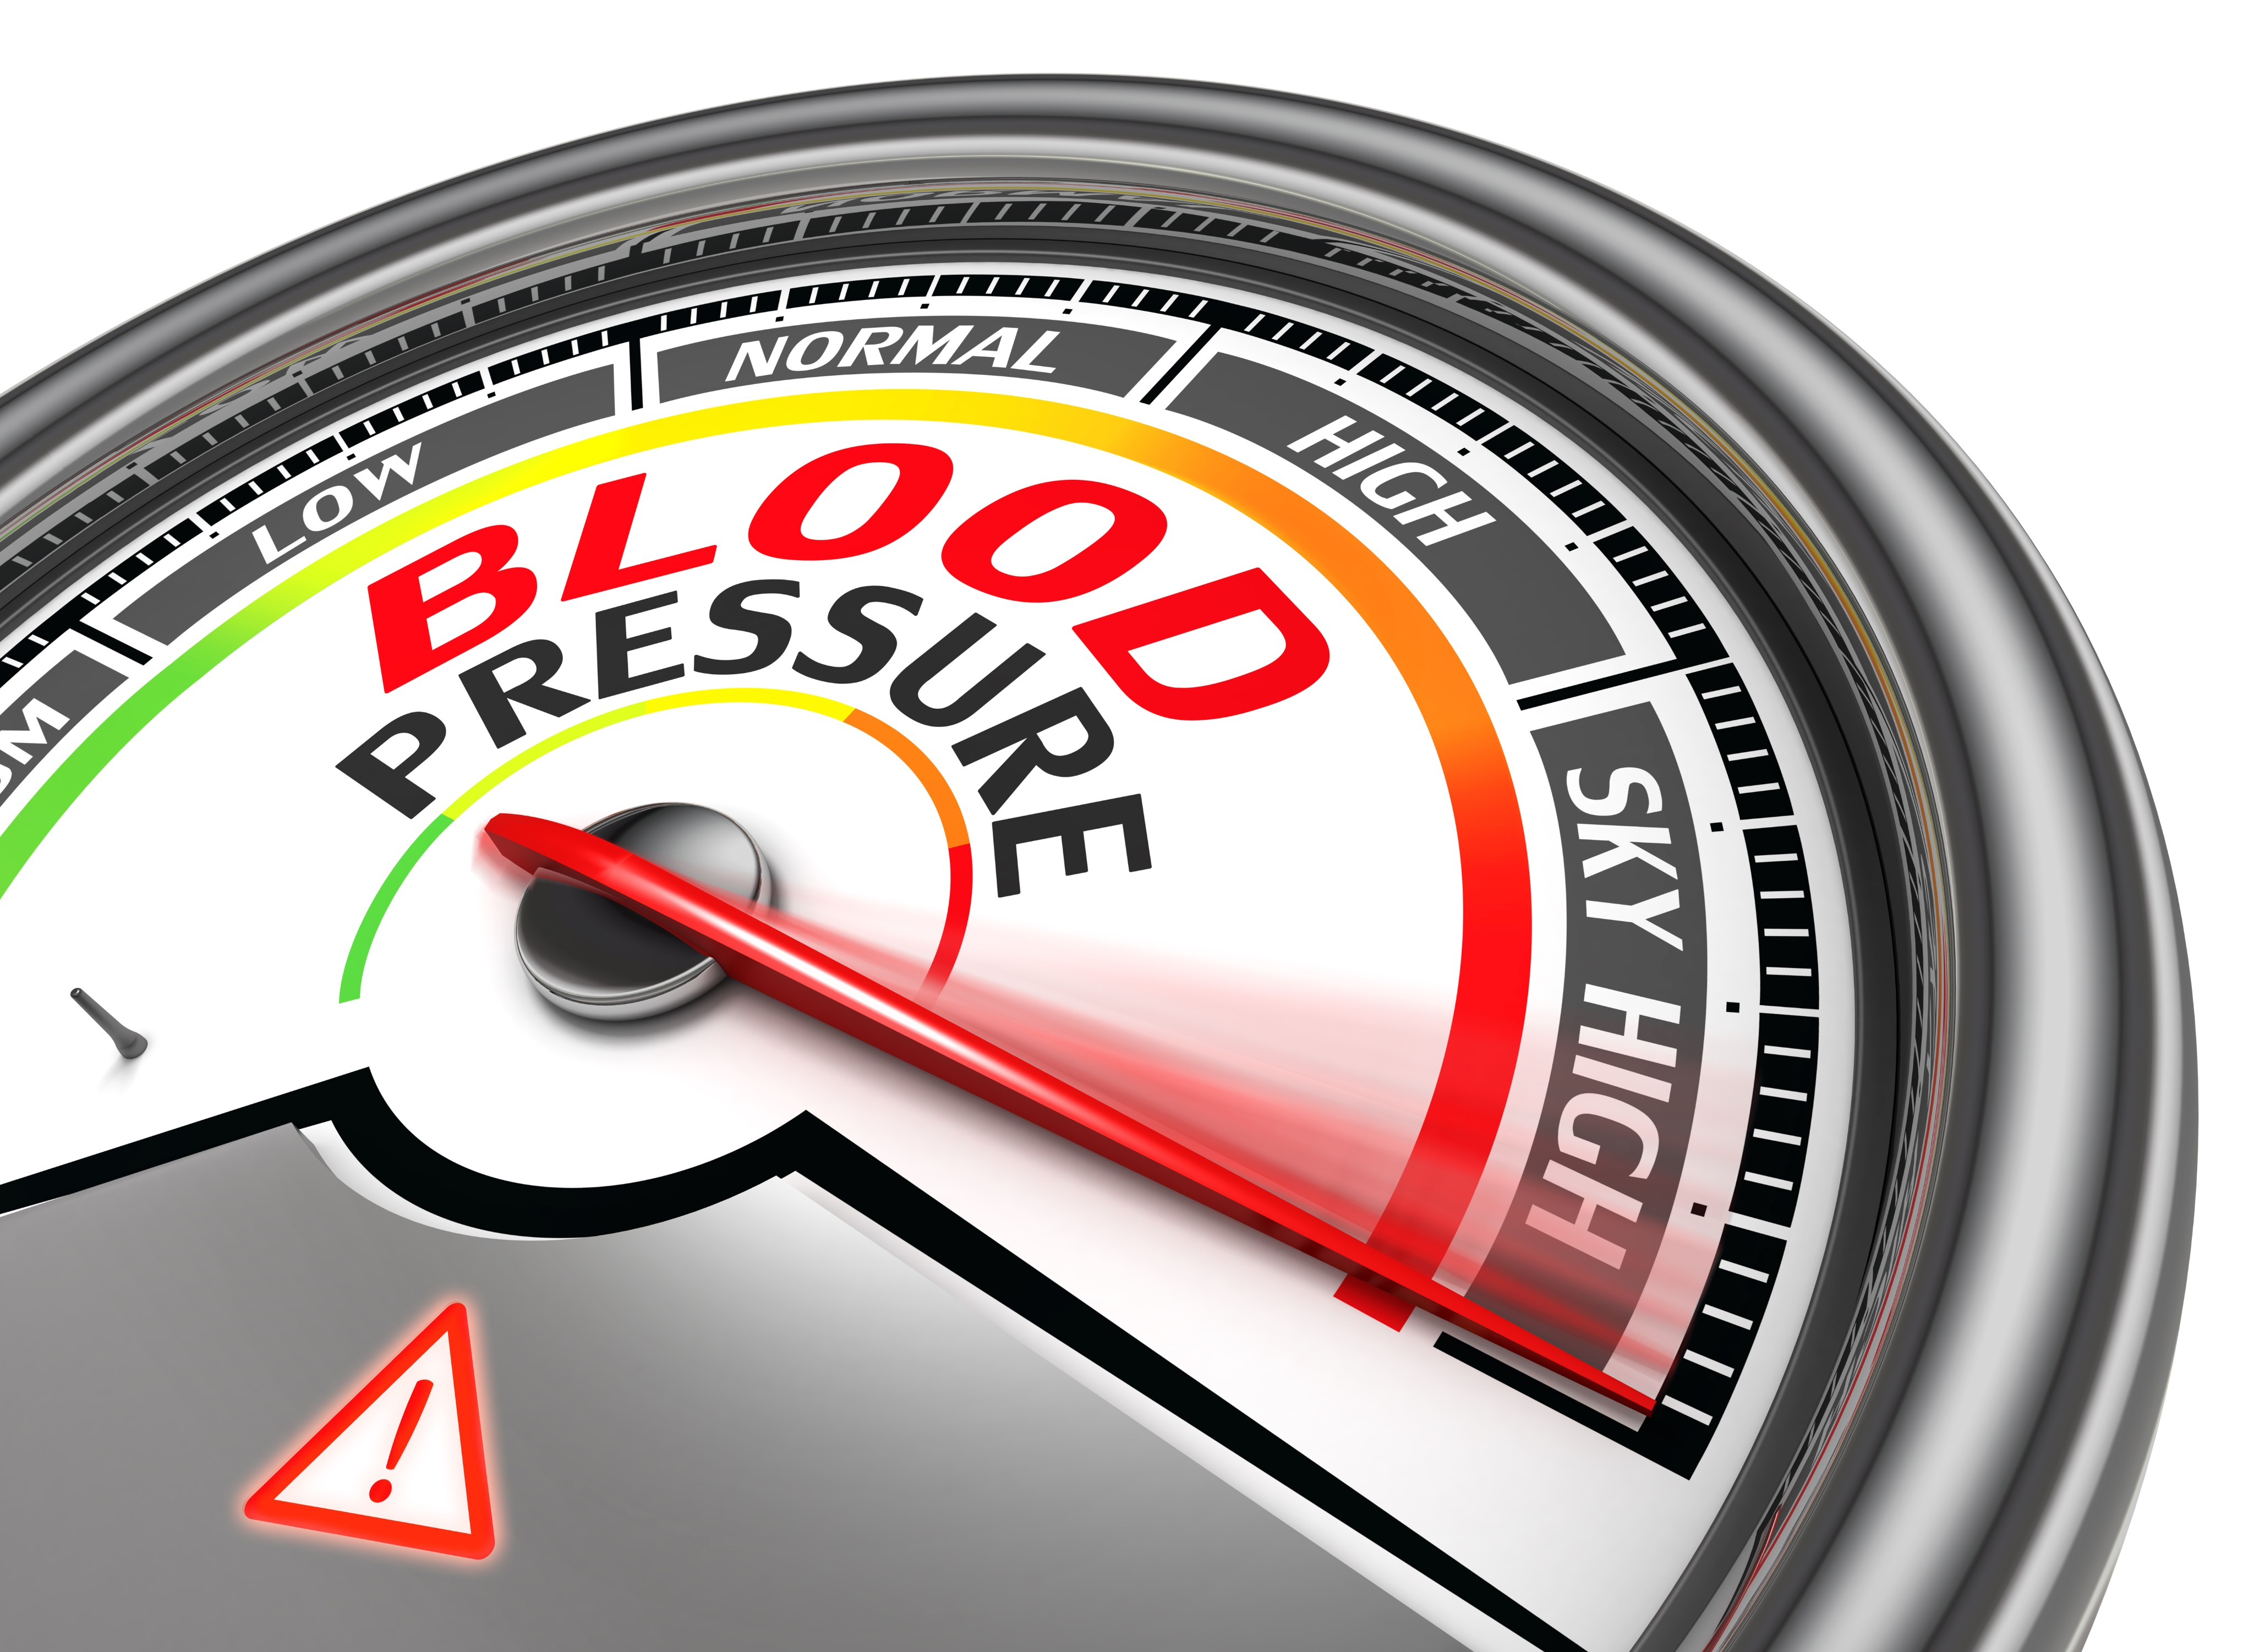 hering és magas vérnyomás)